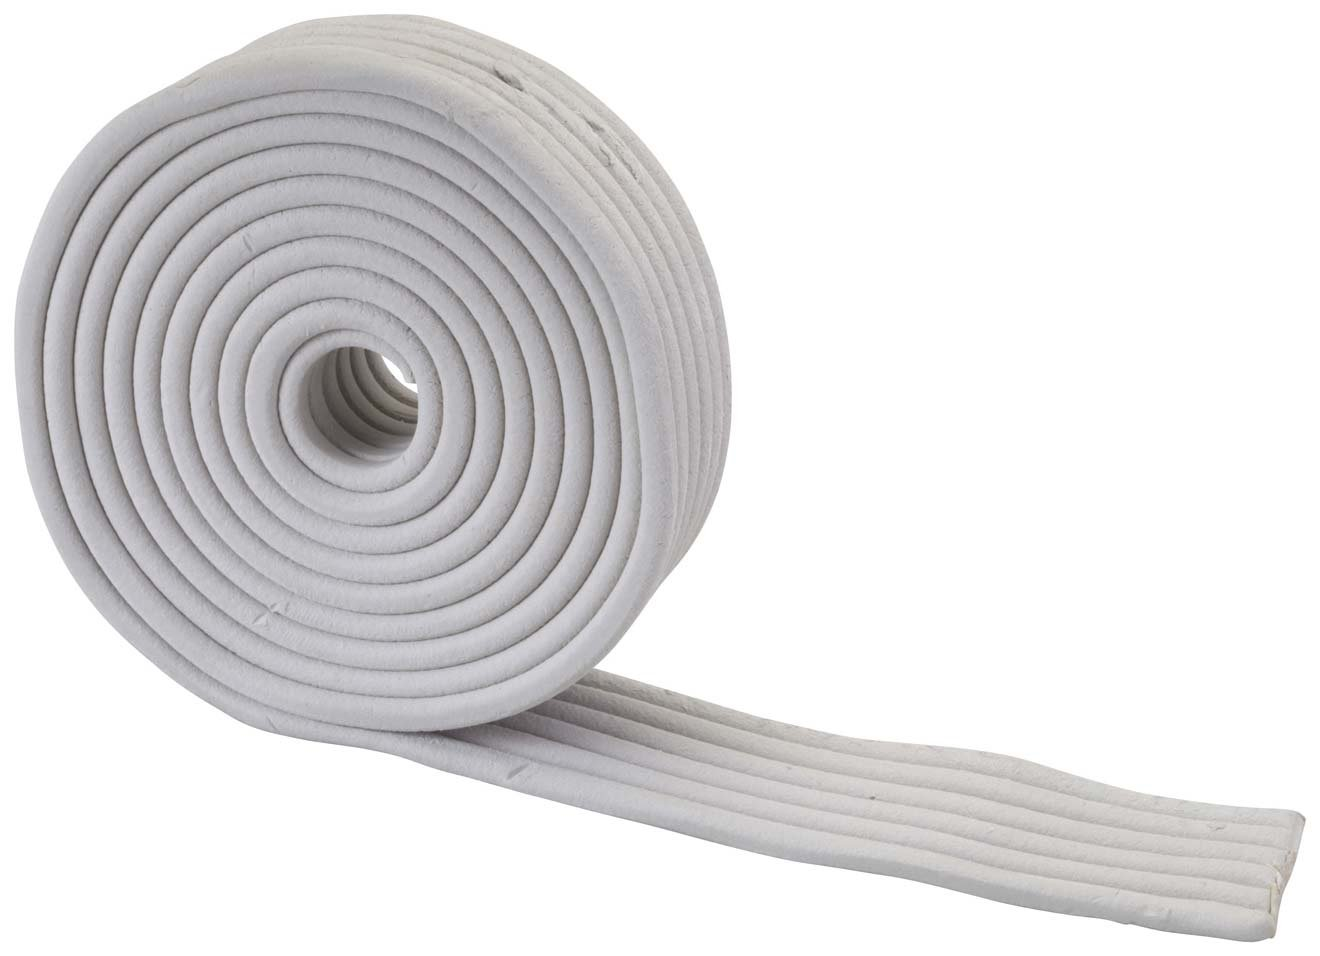 Rope Caulk 30'L Gray